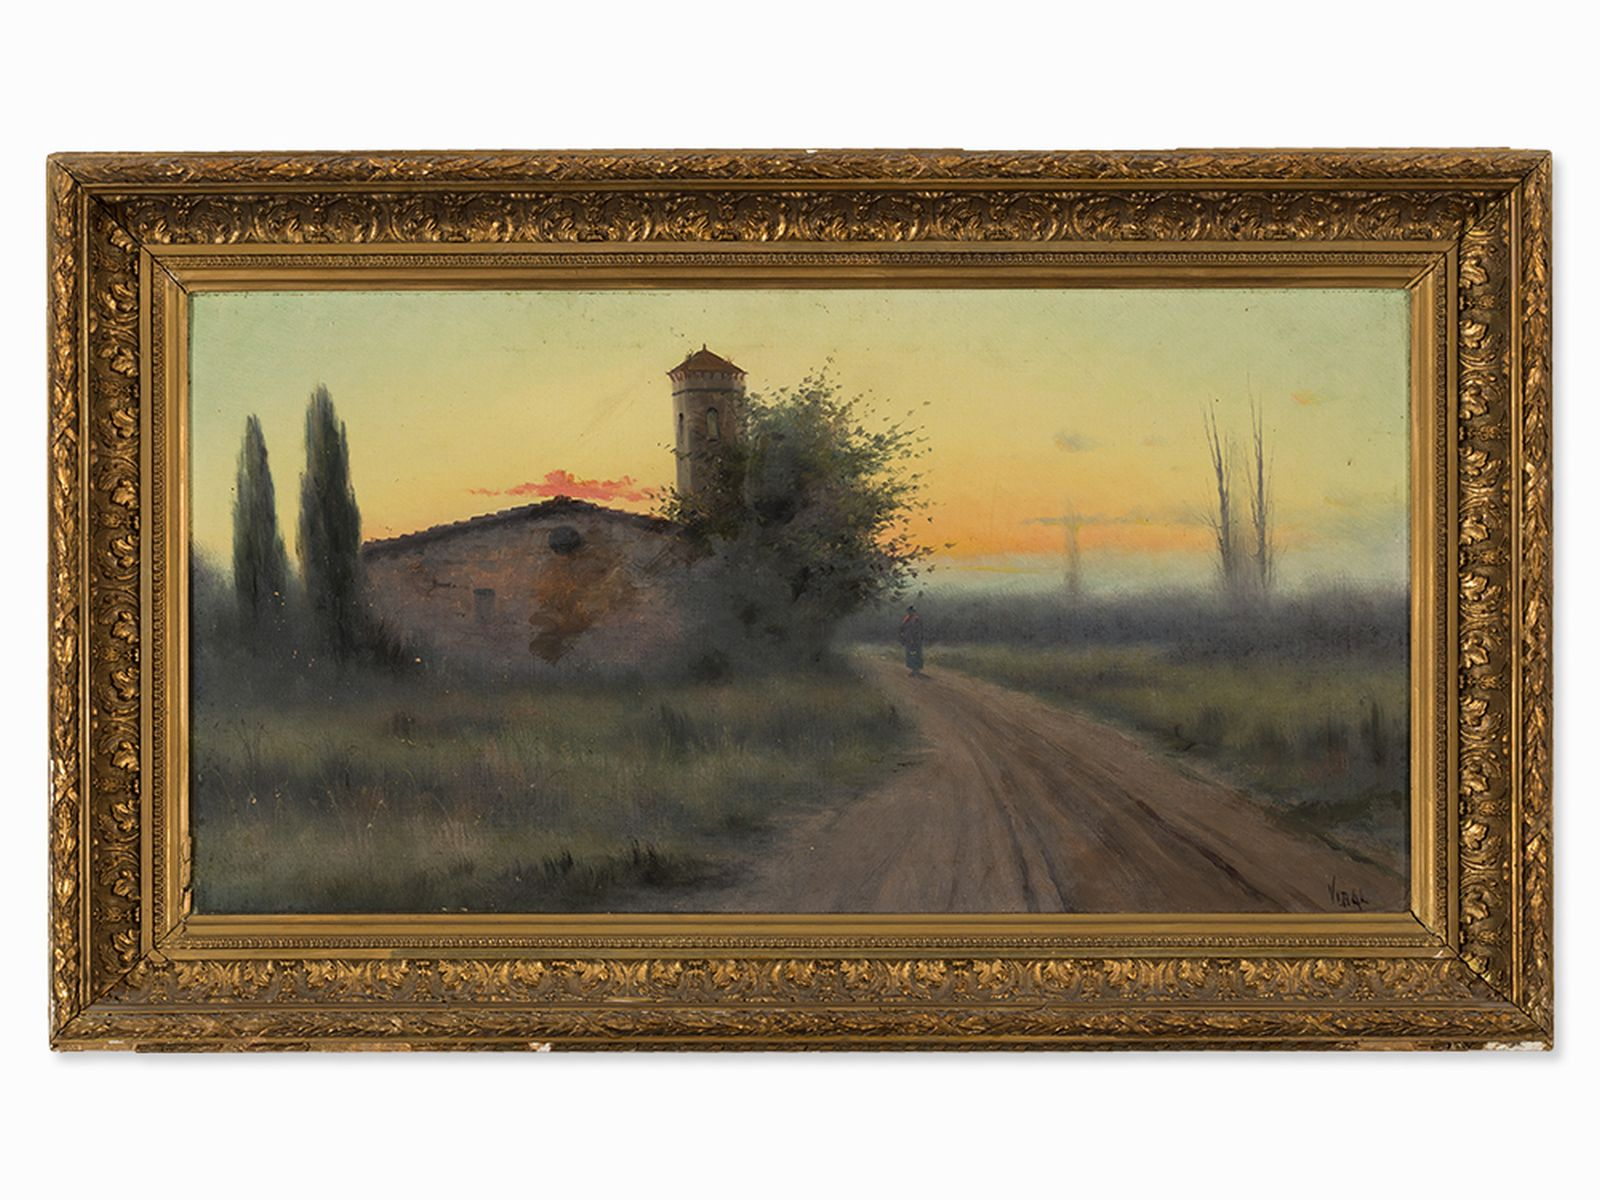 #16 Vidal, Oil Panting, Landscape with Sunset, Spain, 1st H 20th C.|Vidal, Landschaftsgemälde mit Sonnenuntergang, Spanien, 20. Jh. Image